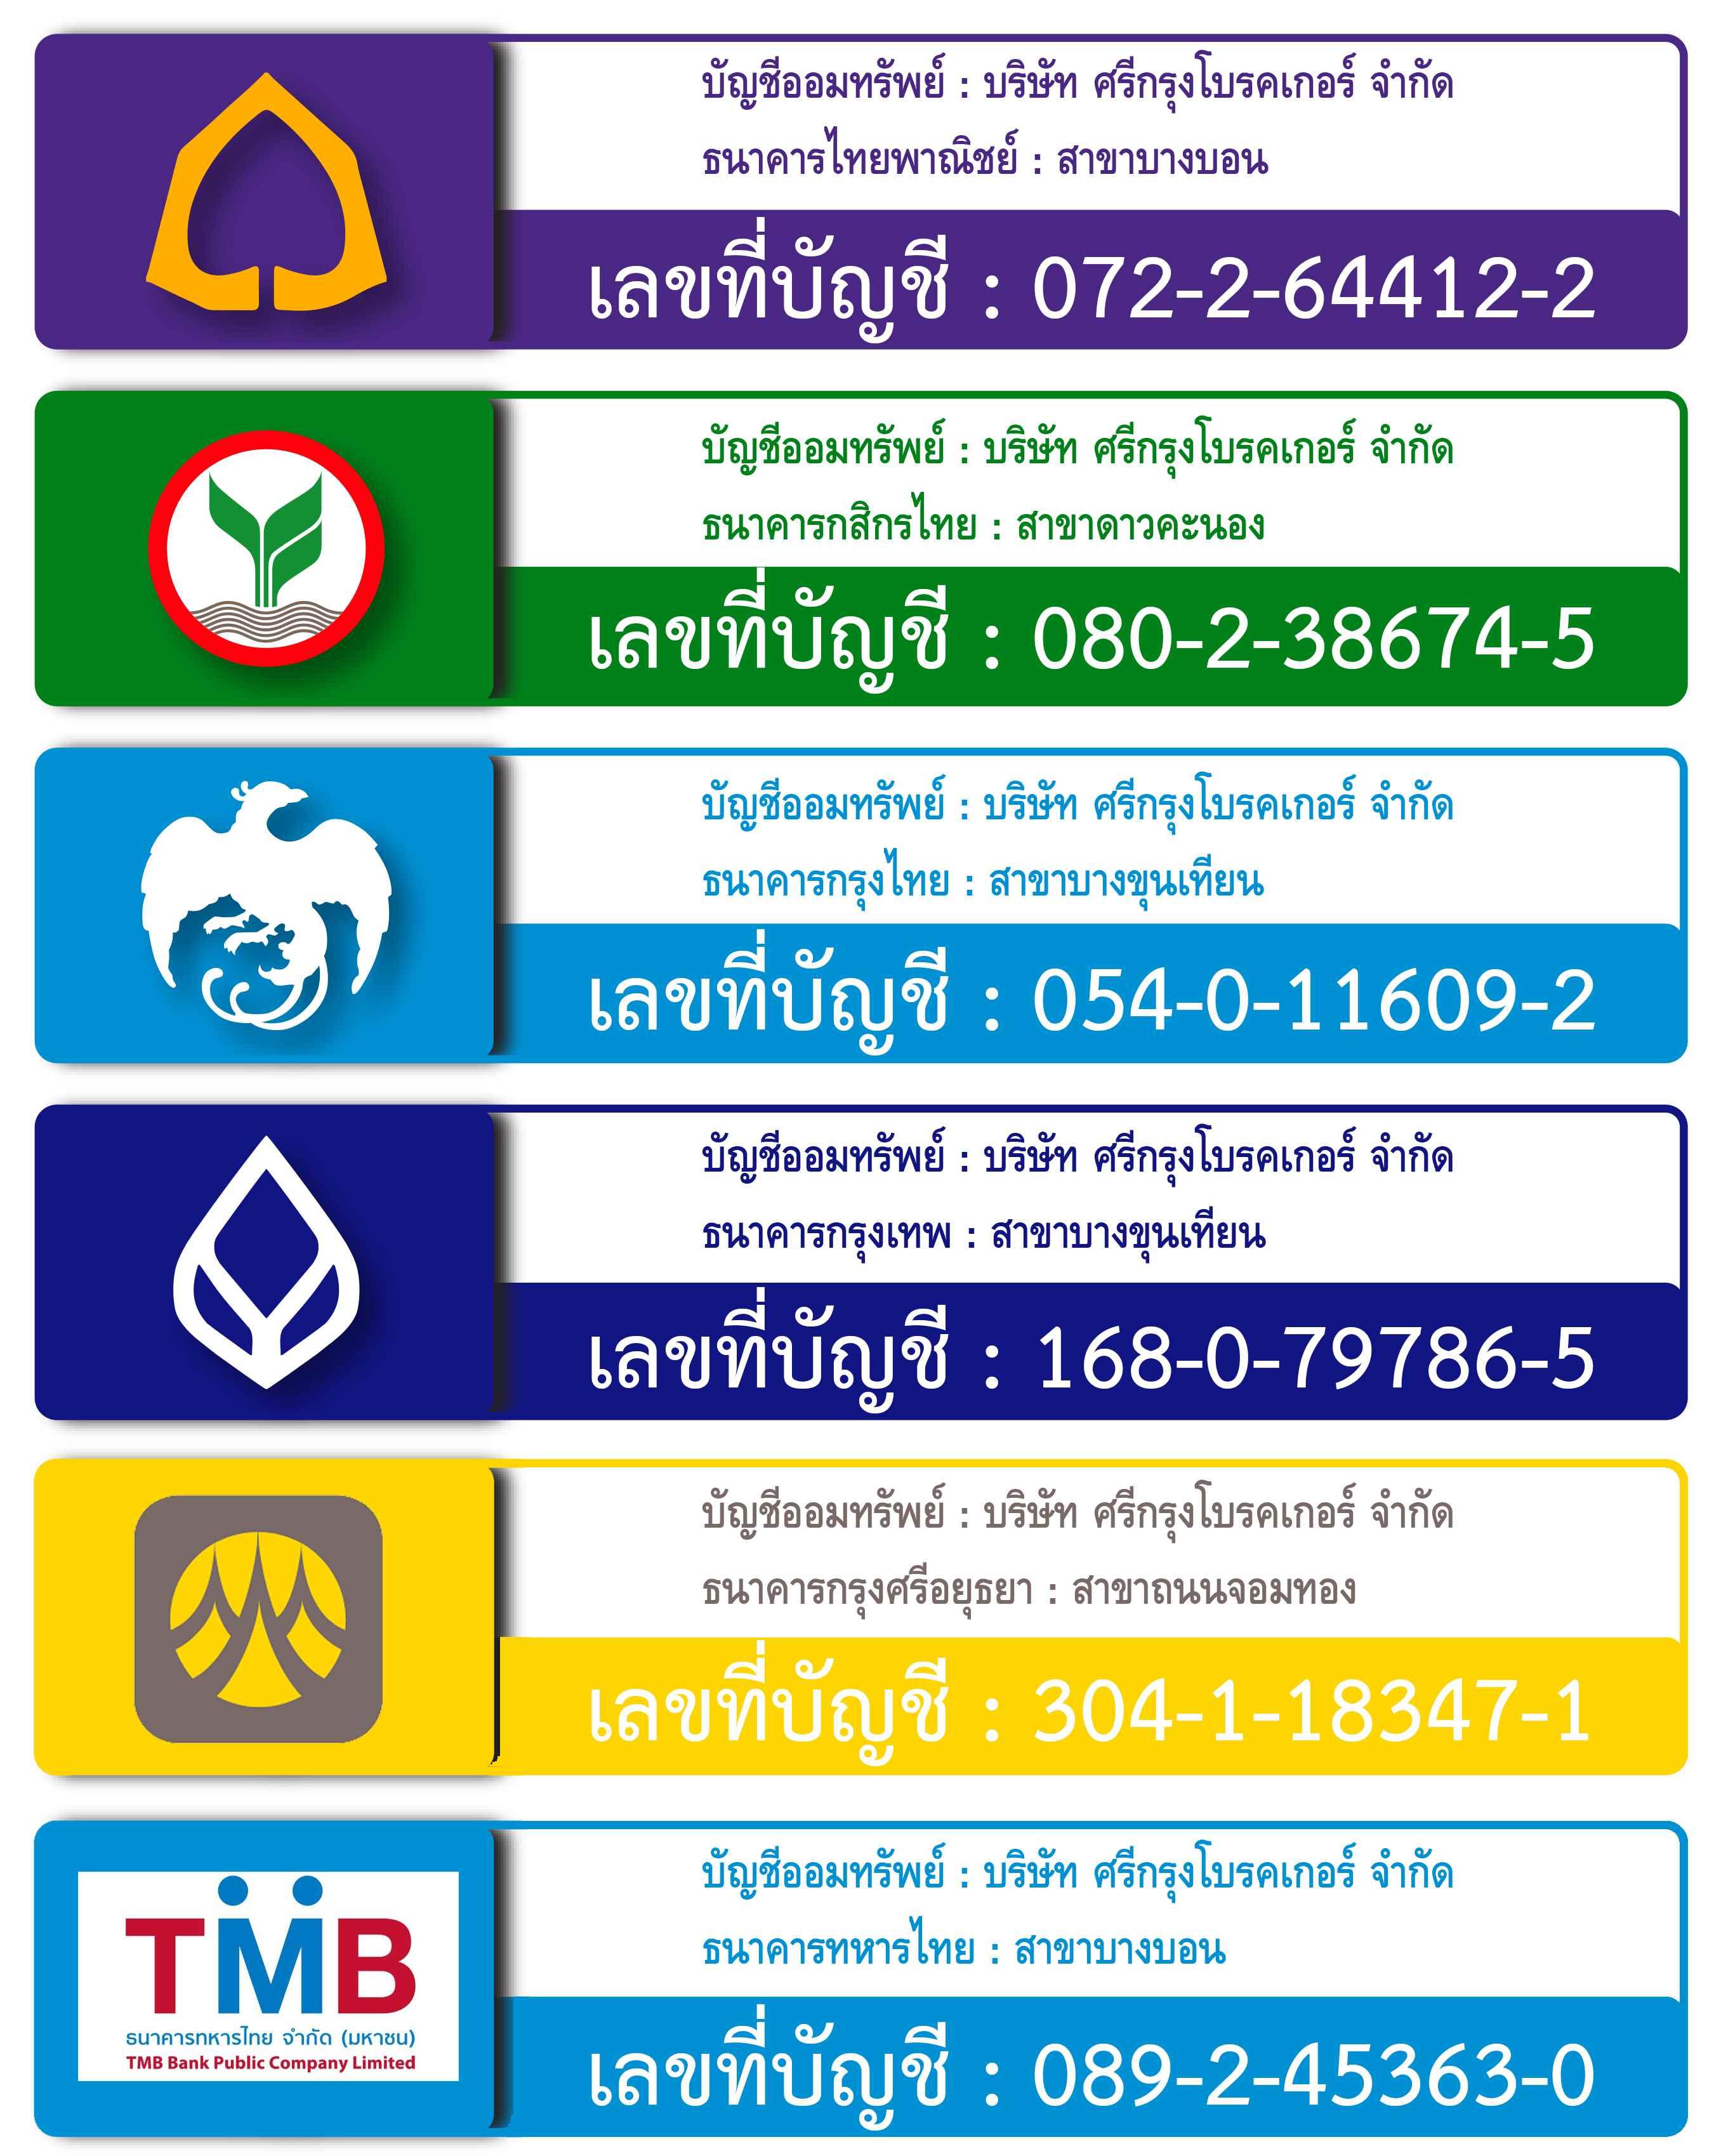 bankofsrikrung-bkk